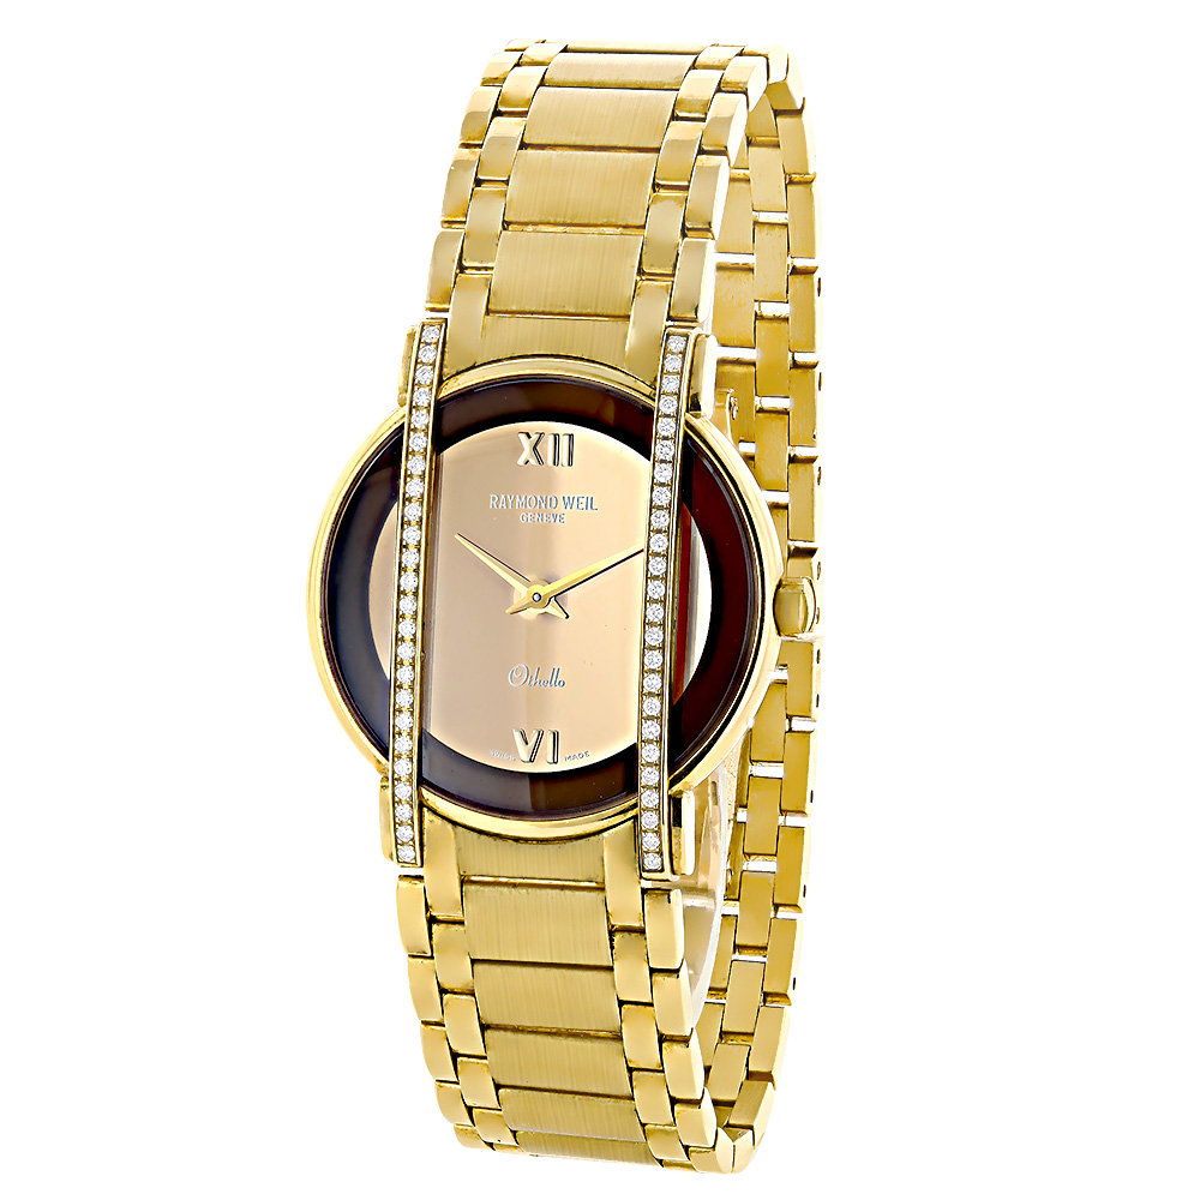 Raymond Weil Luxury Watches: Othello Ladies 18K Gold Diamond Watch 0.48ct